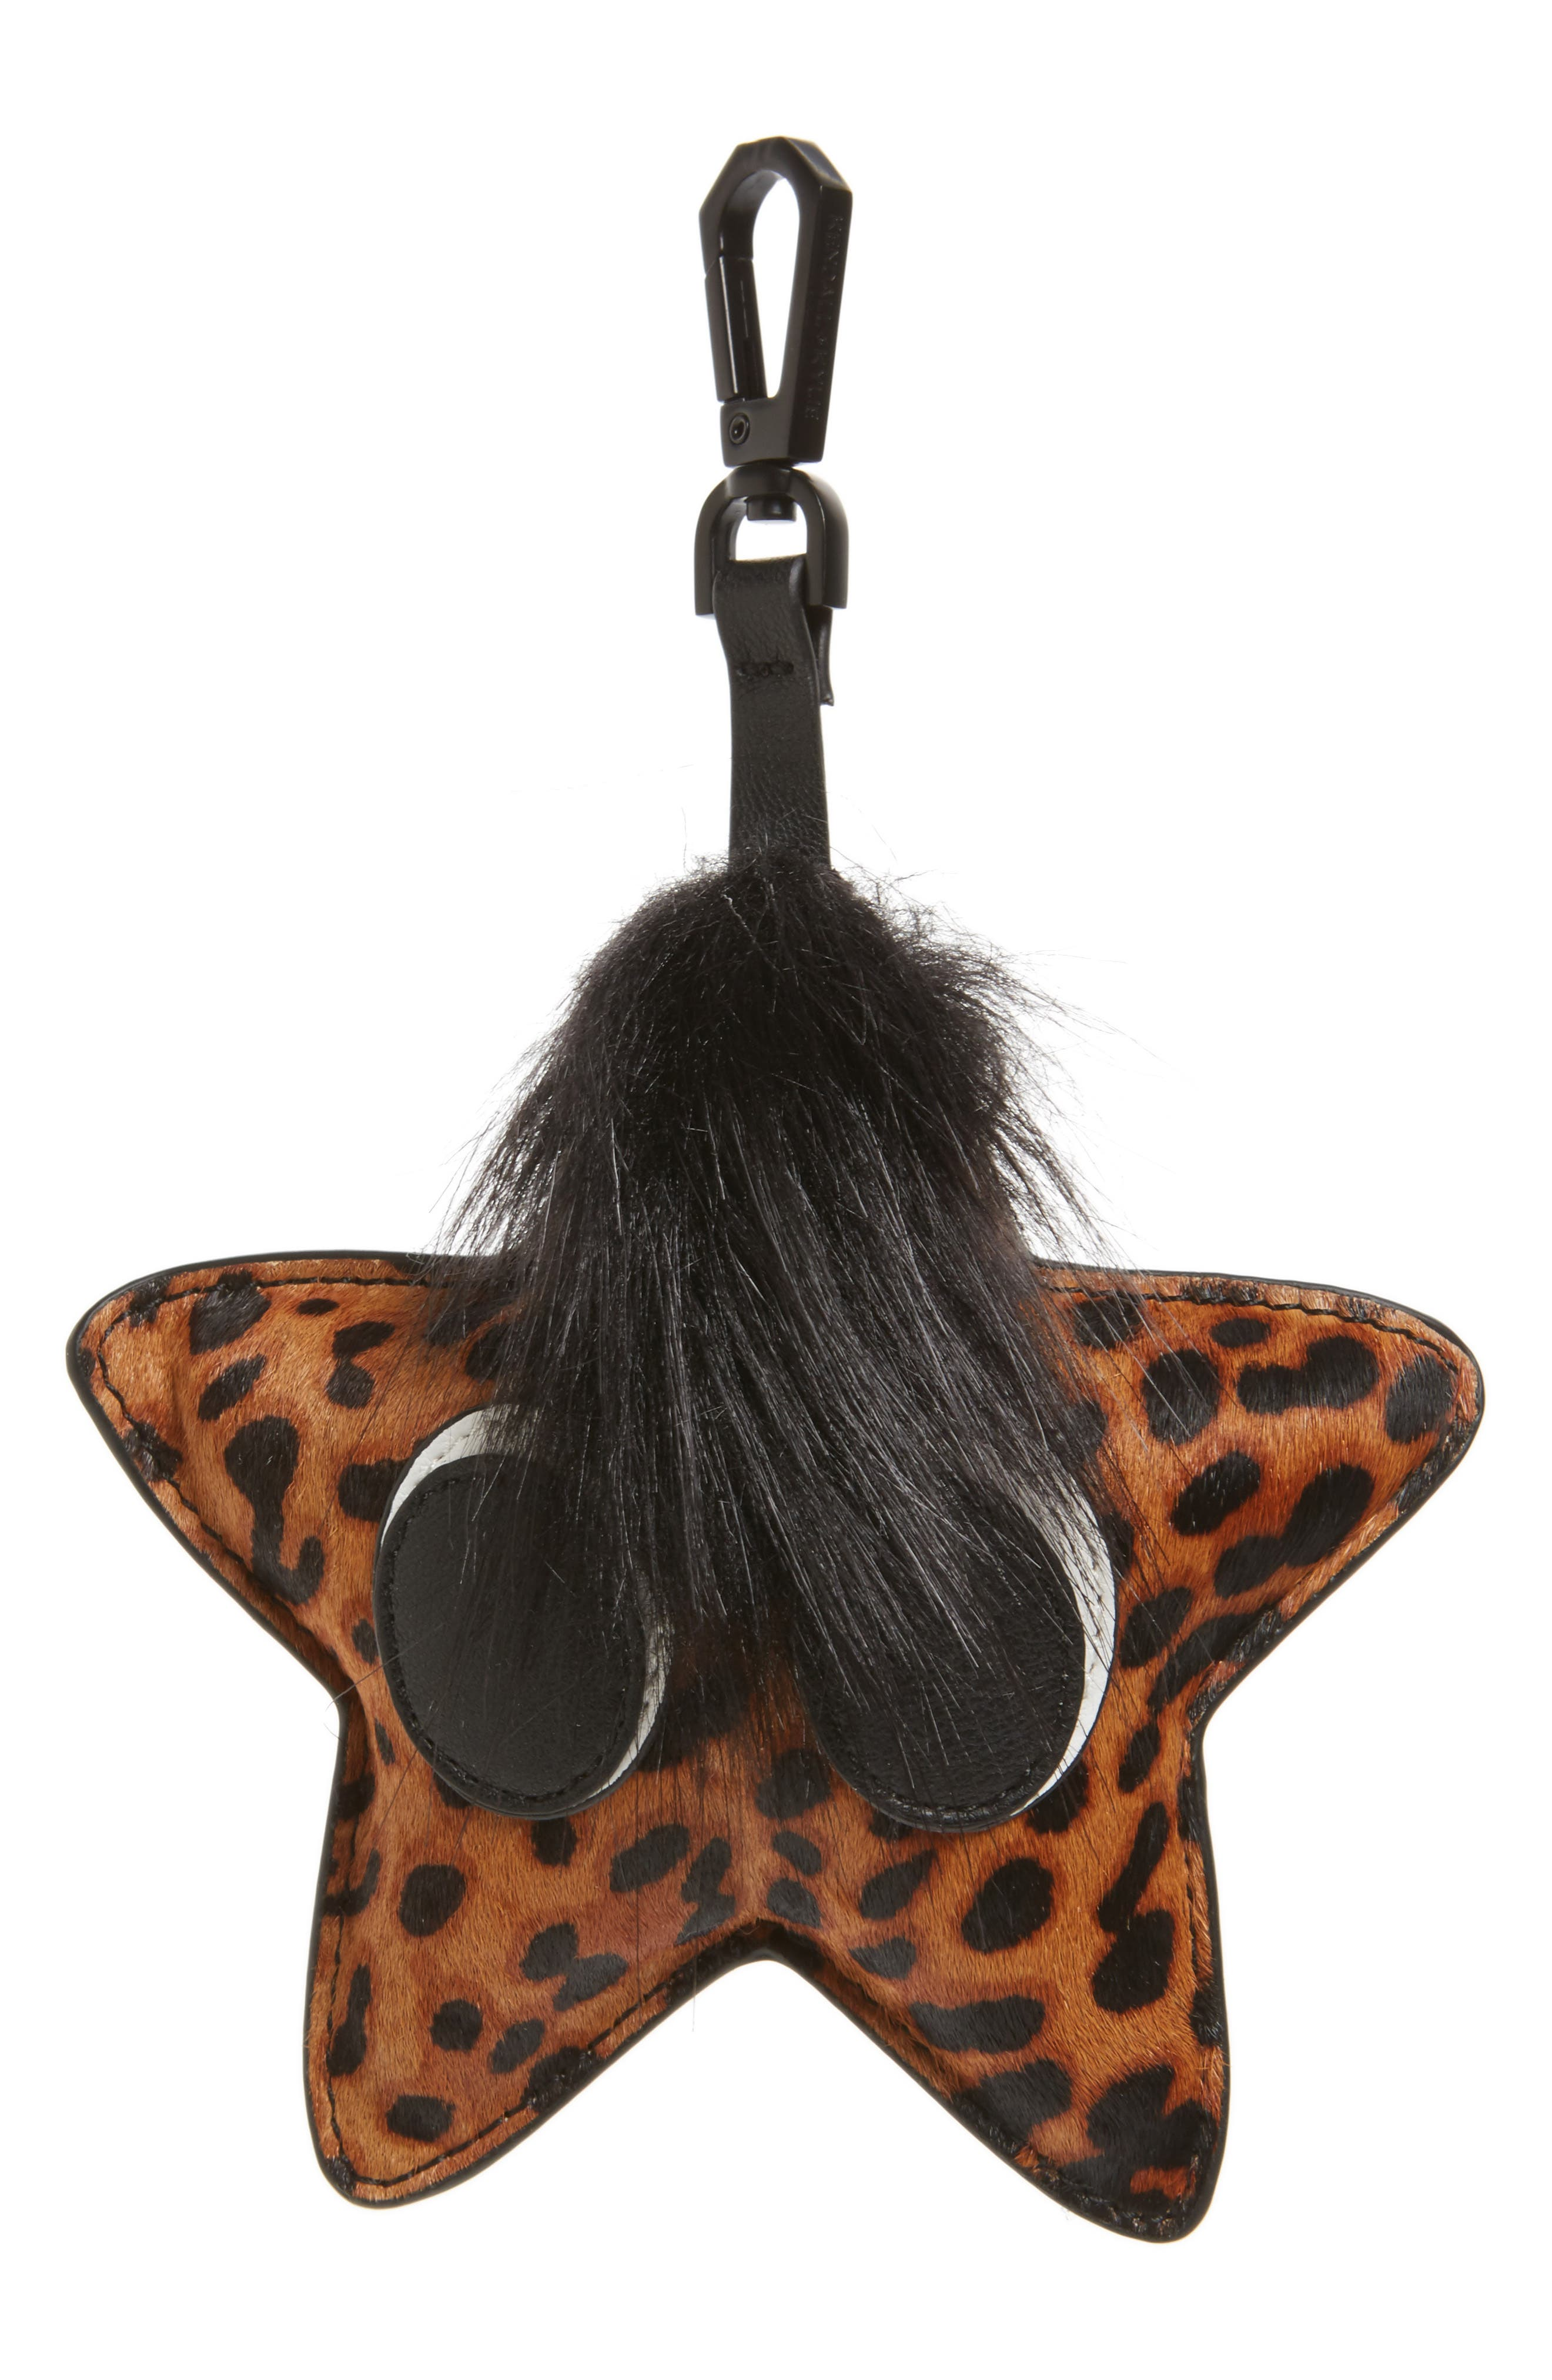 Alternate Image 1 Selected - KENDALL + KYLIE Starboy Faux Fur & Genuine Calf Hair Bag Charm